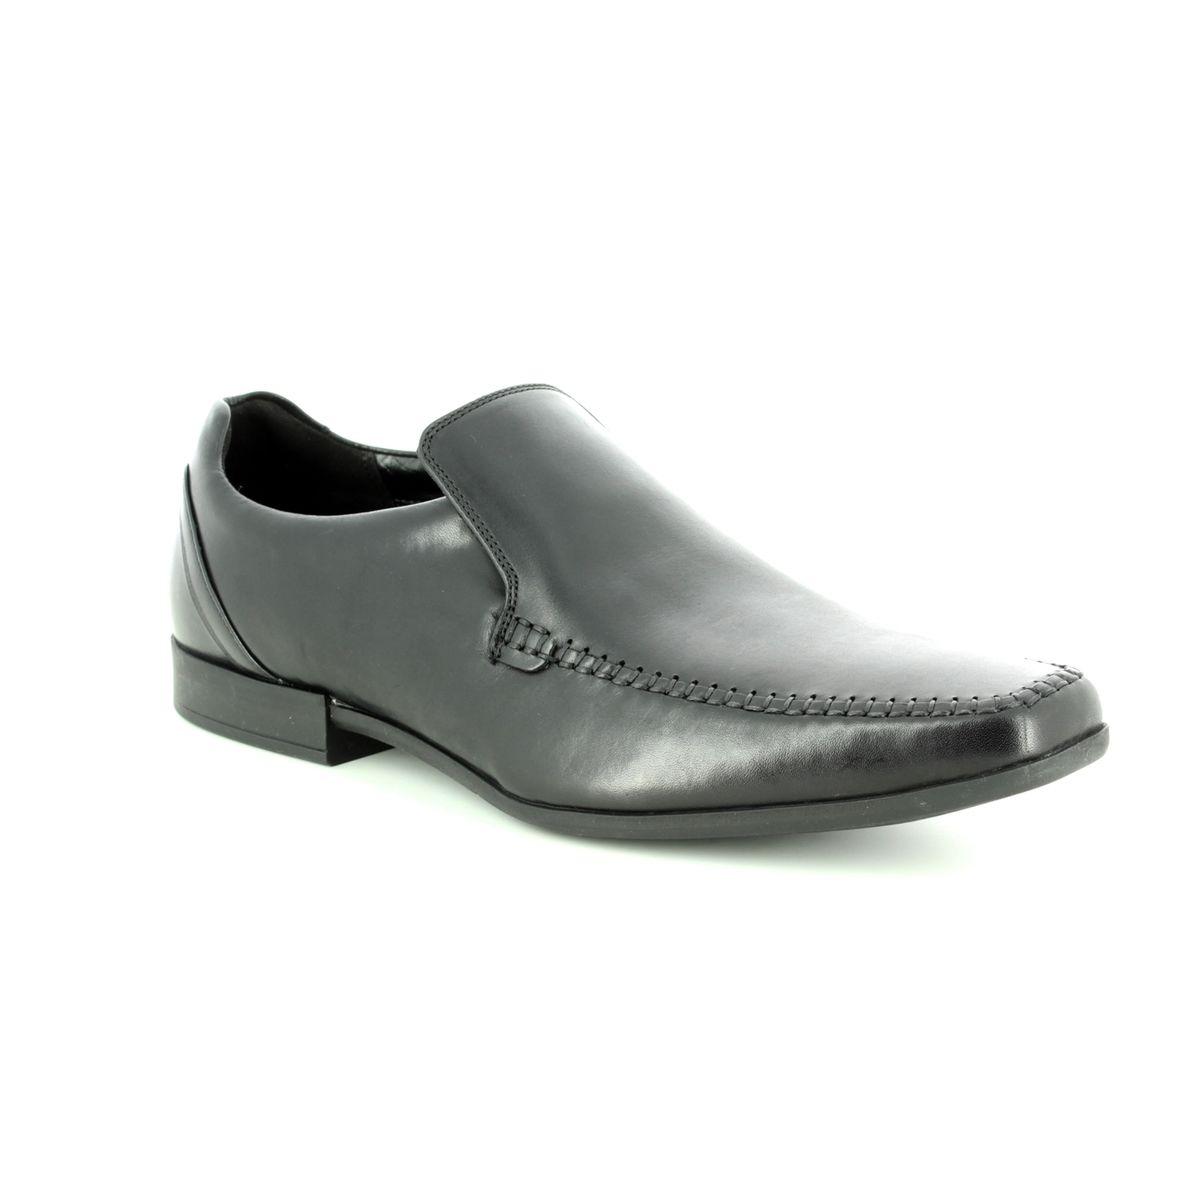 19e8e9ed15b Clarks Formal Shoes - Black leather - 3542 87G GLEMENT SEAM